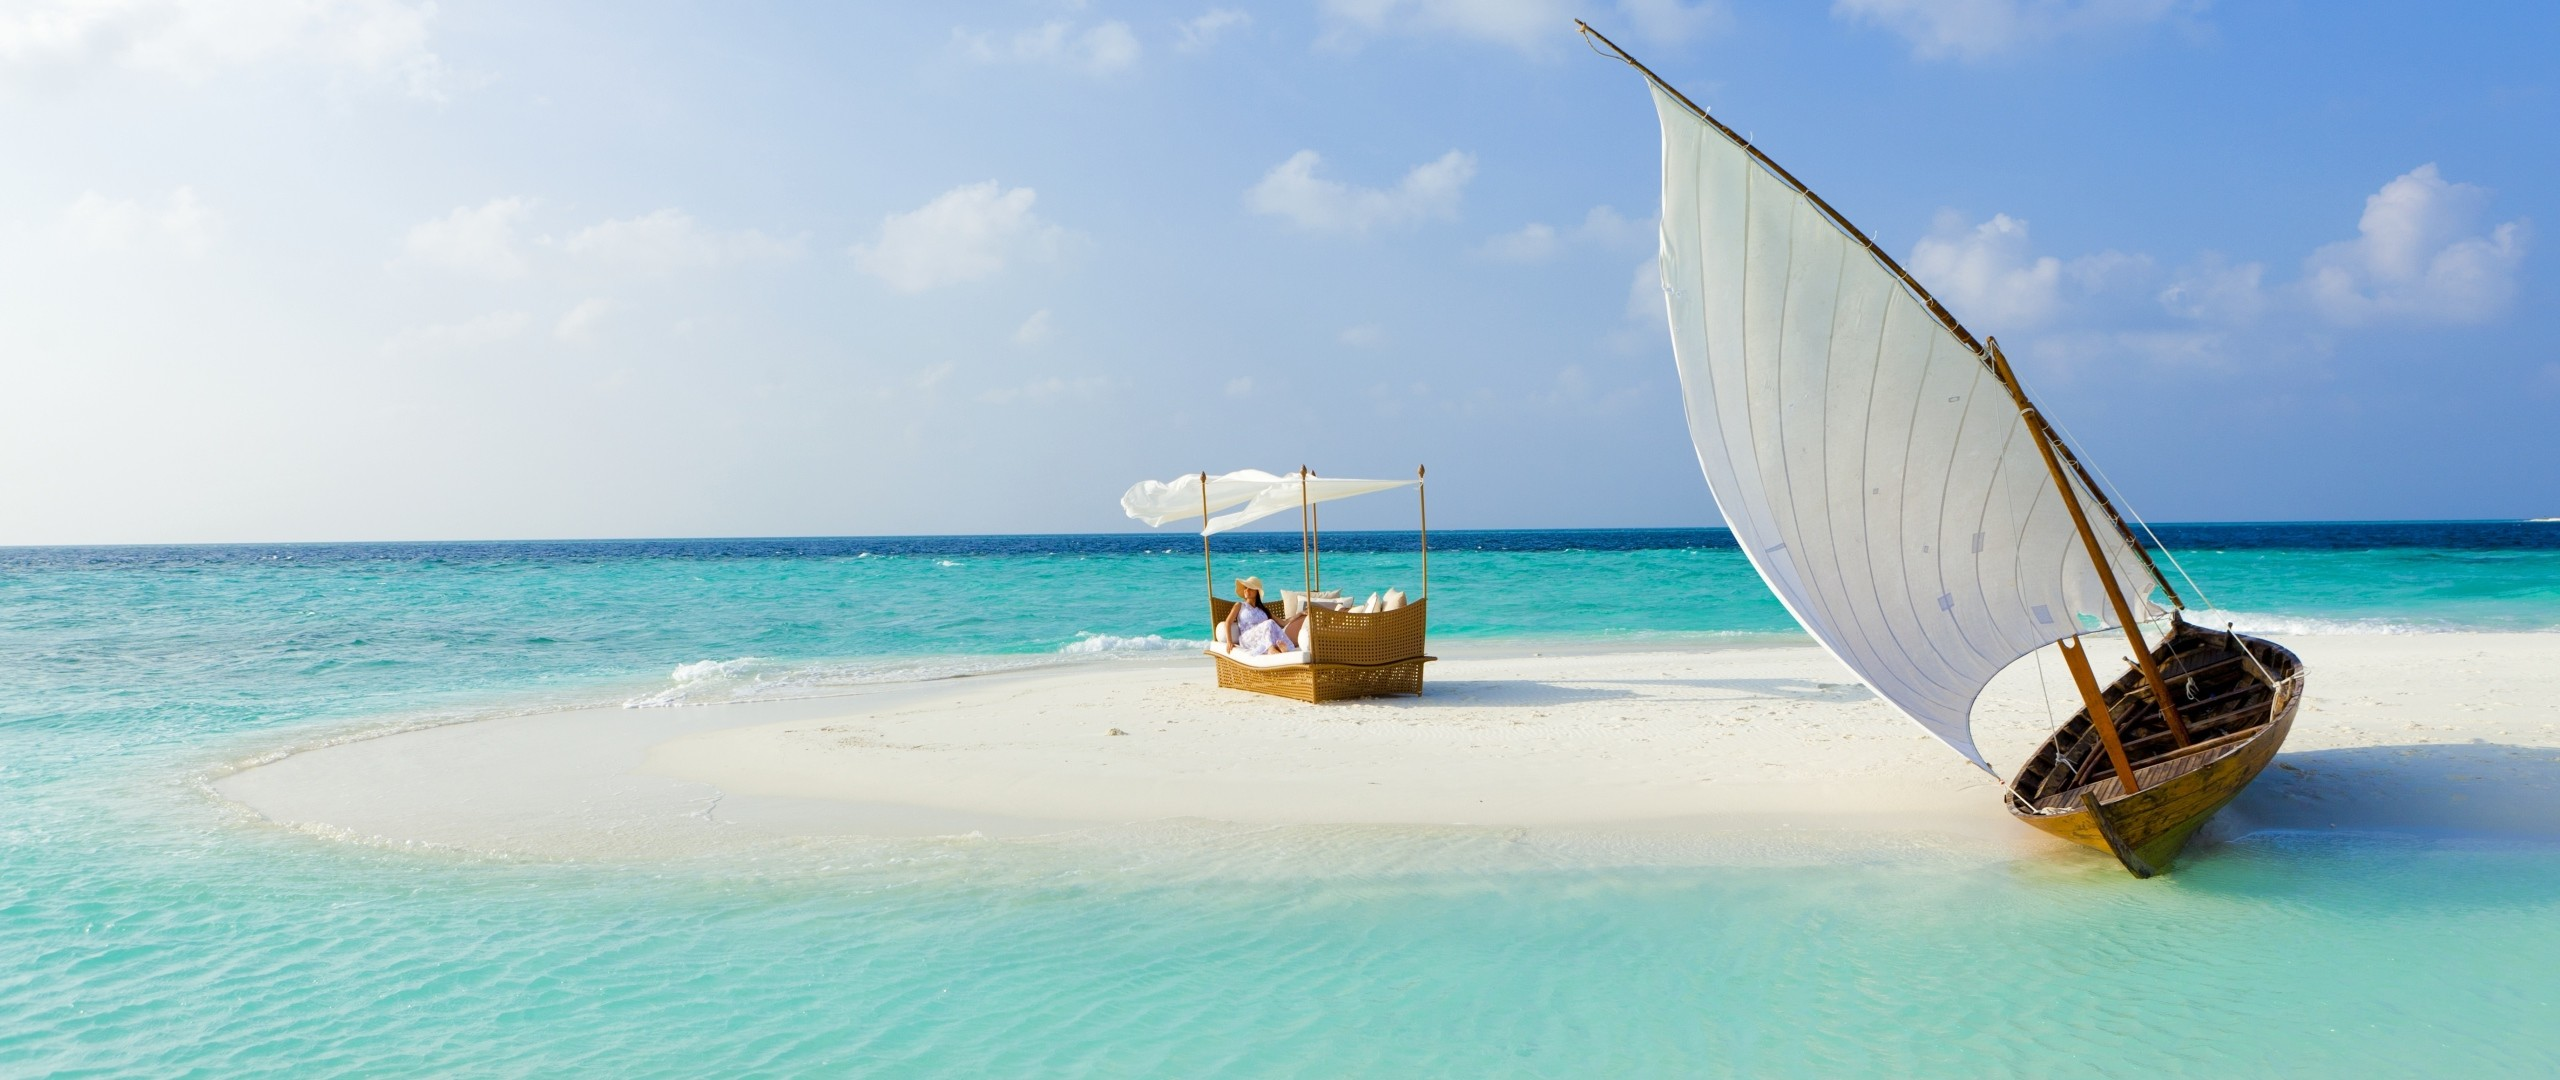 download wallpaper maldives beach tropical sea hd wallpaper .